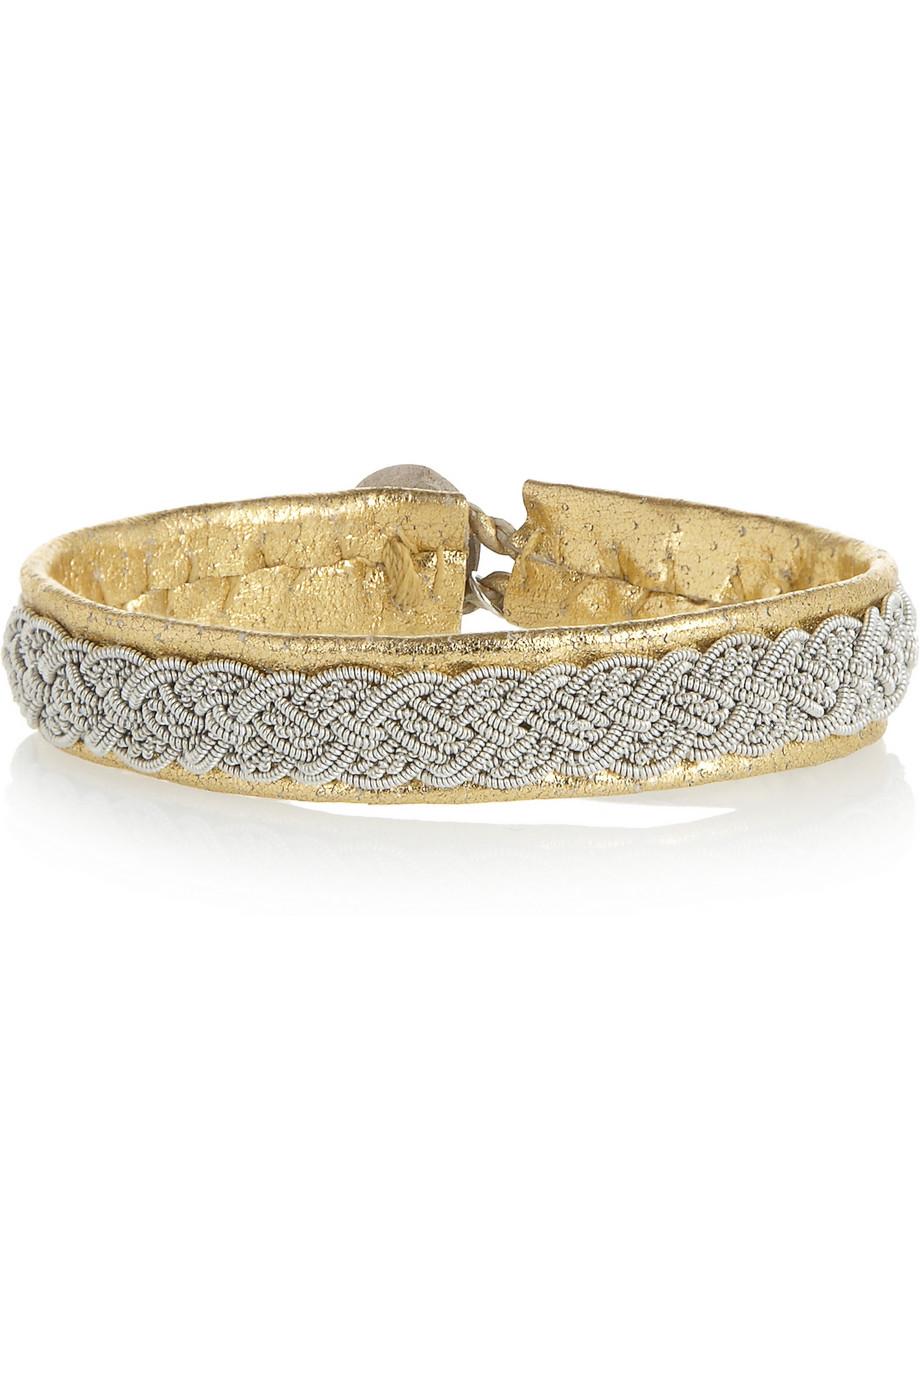 Maria Rudman Embroidered Leather Bracelet In Metallic Lyst